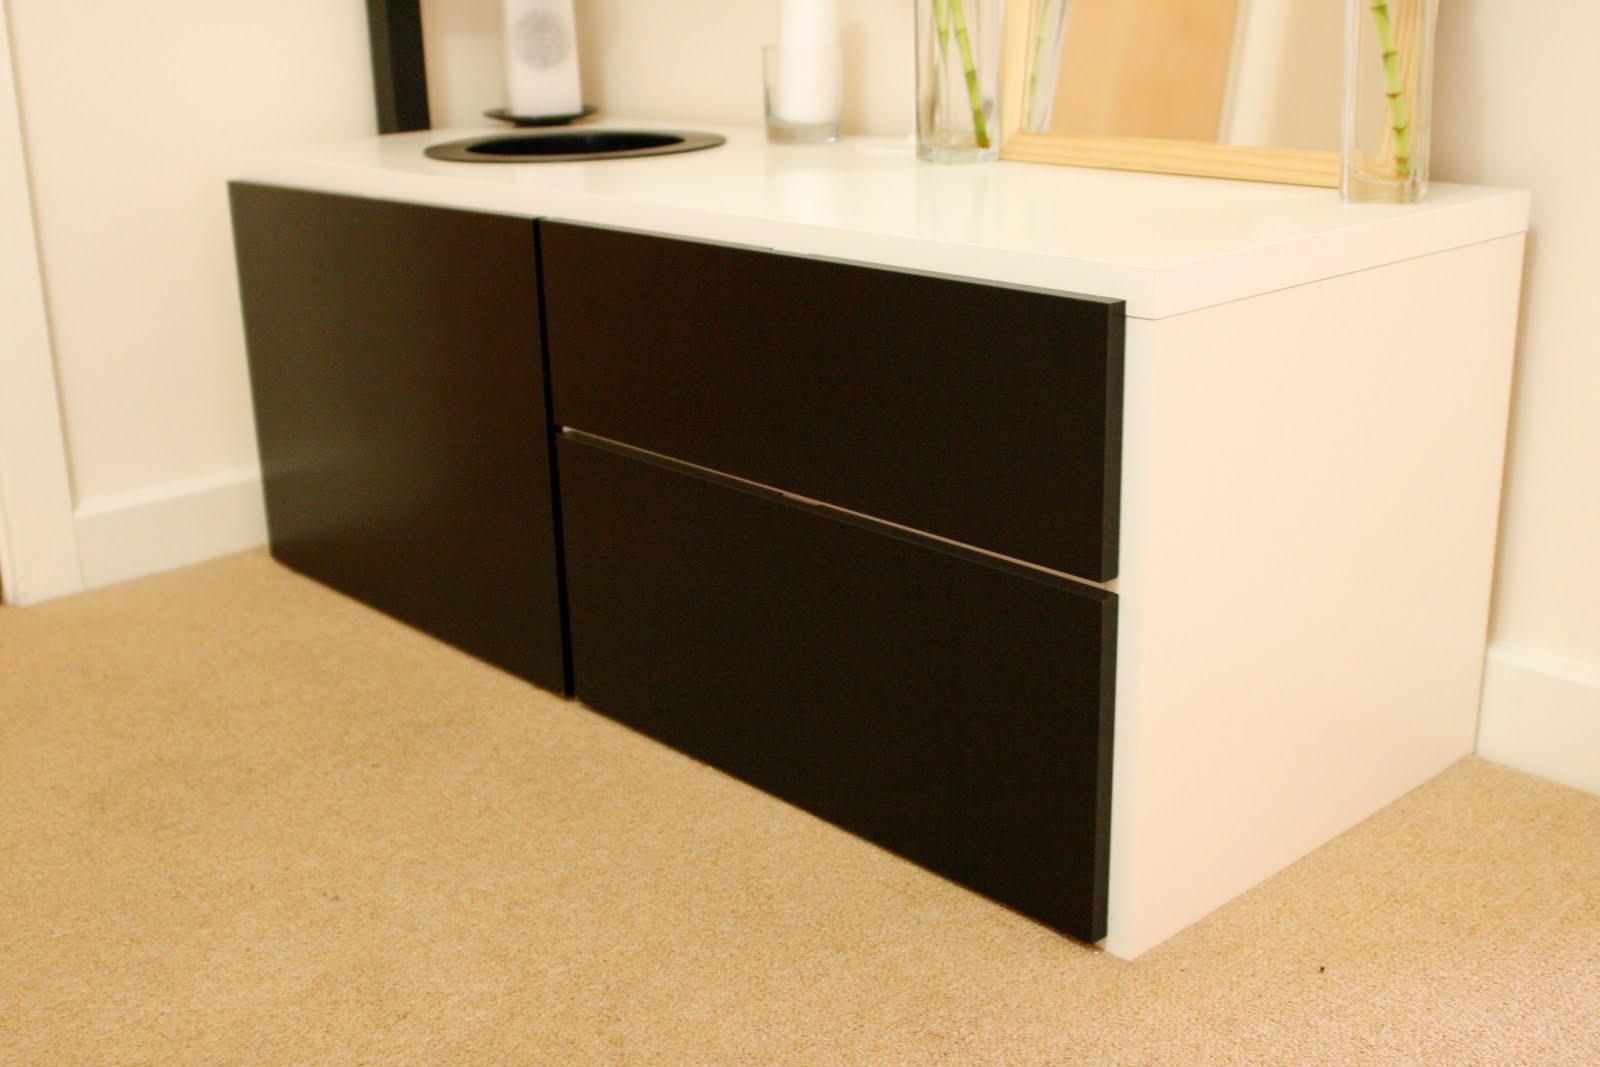 ikea odda storage unit with coat stand ebay. Black Bedroom Furniture Sets. Home Design Ideas